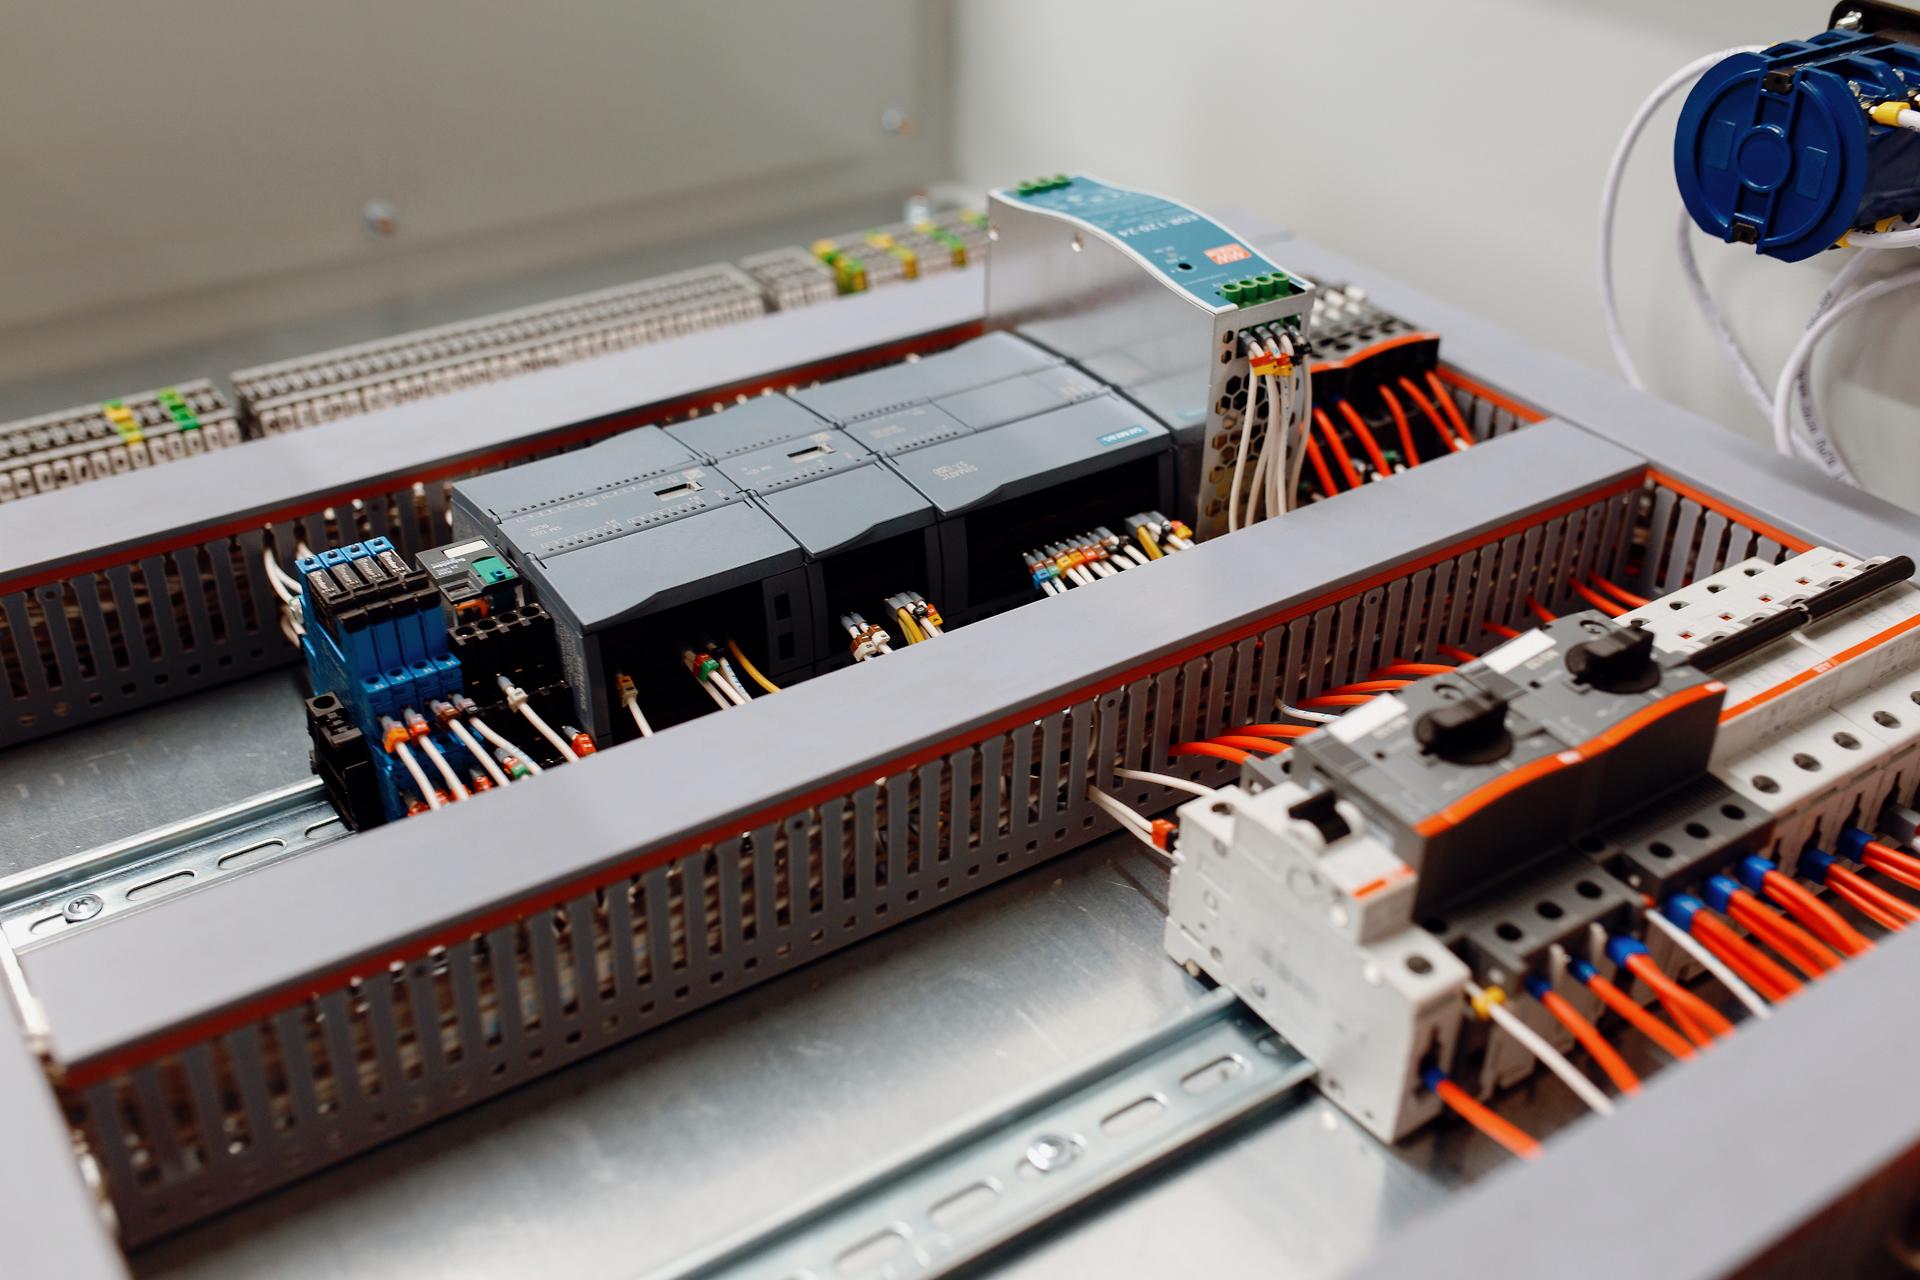 Equipment control cabinets